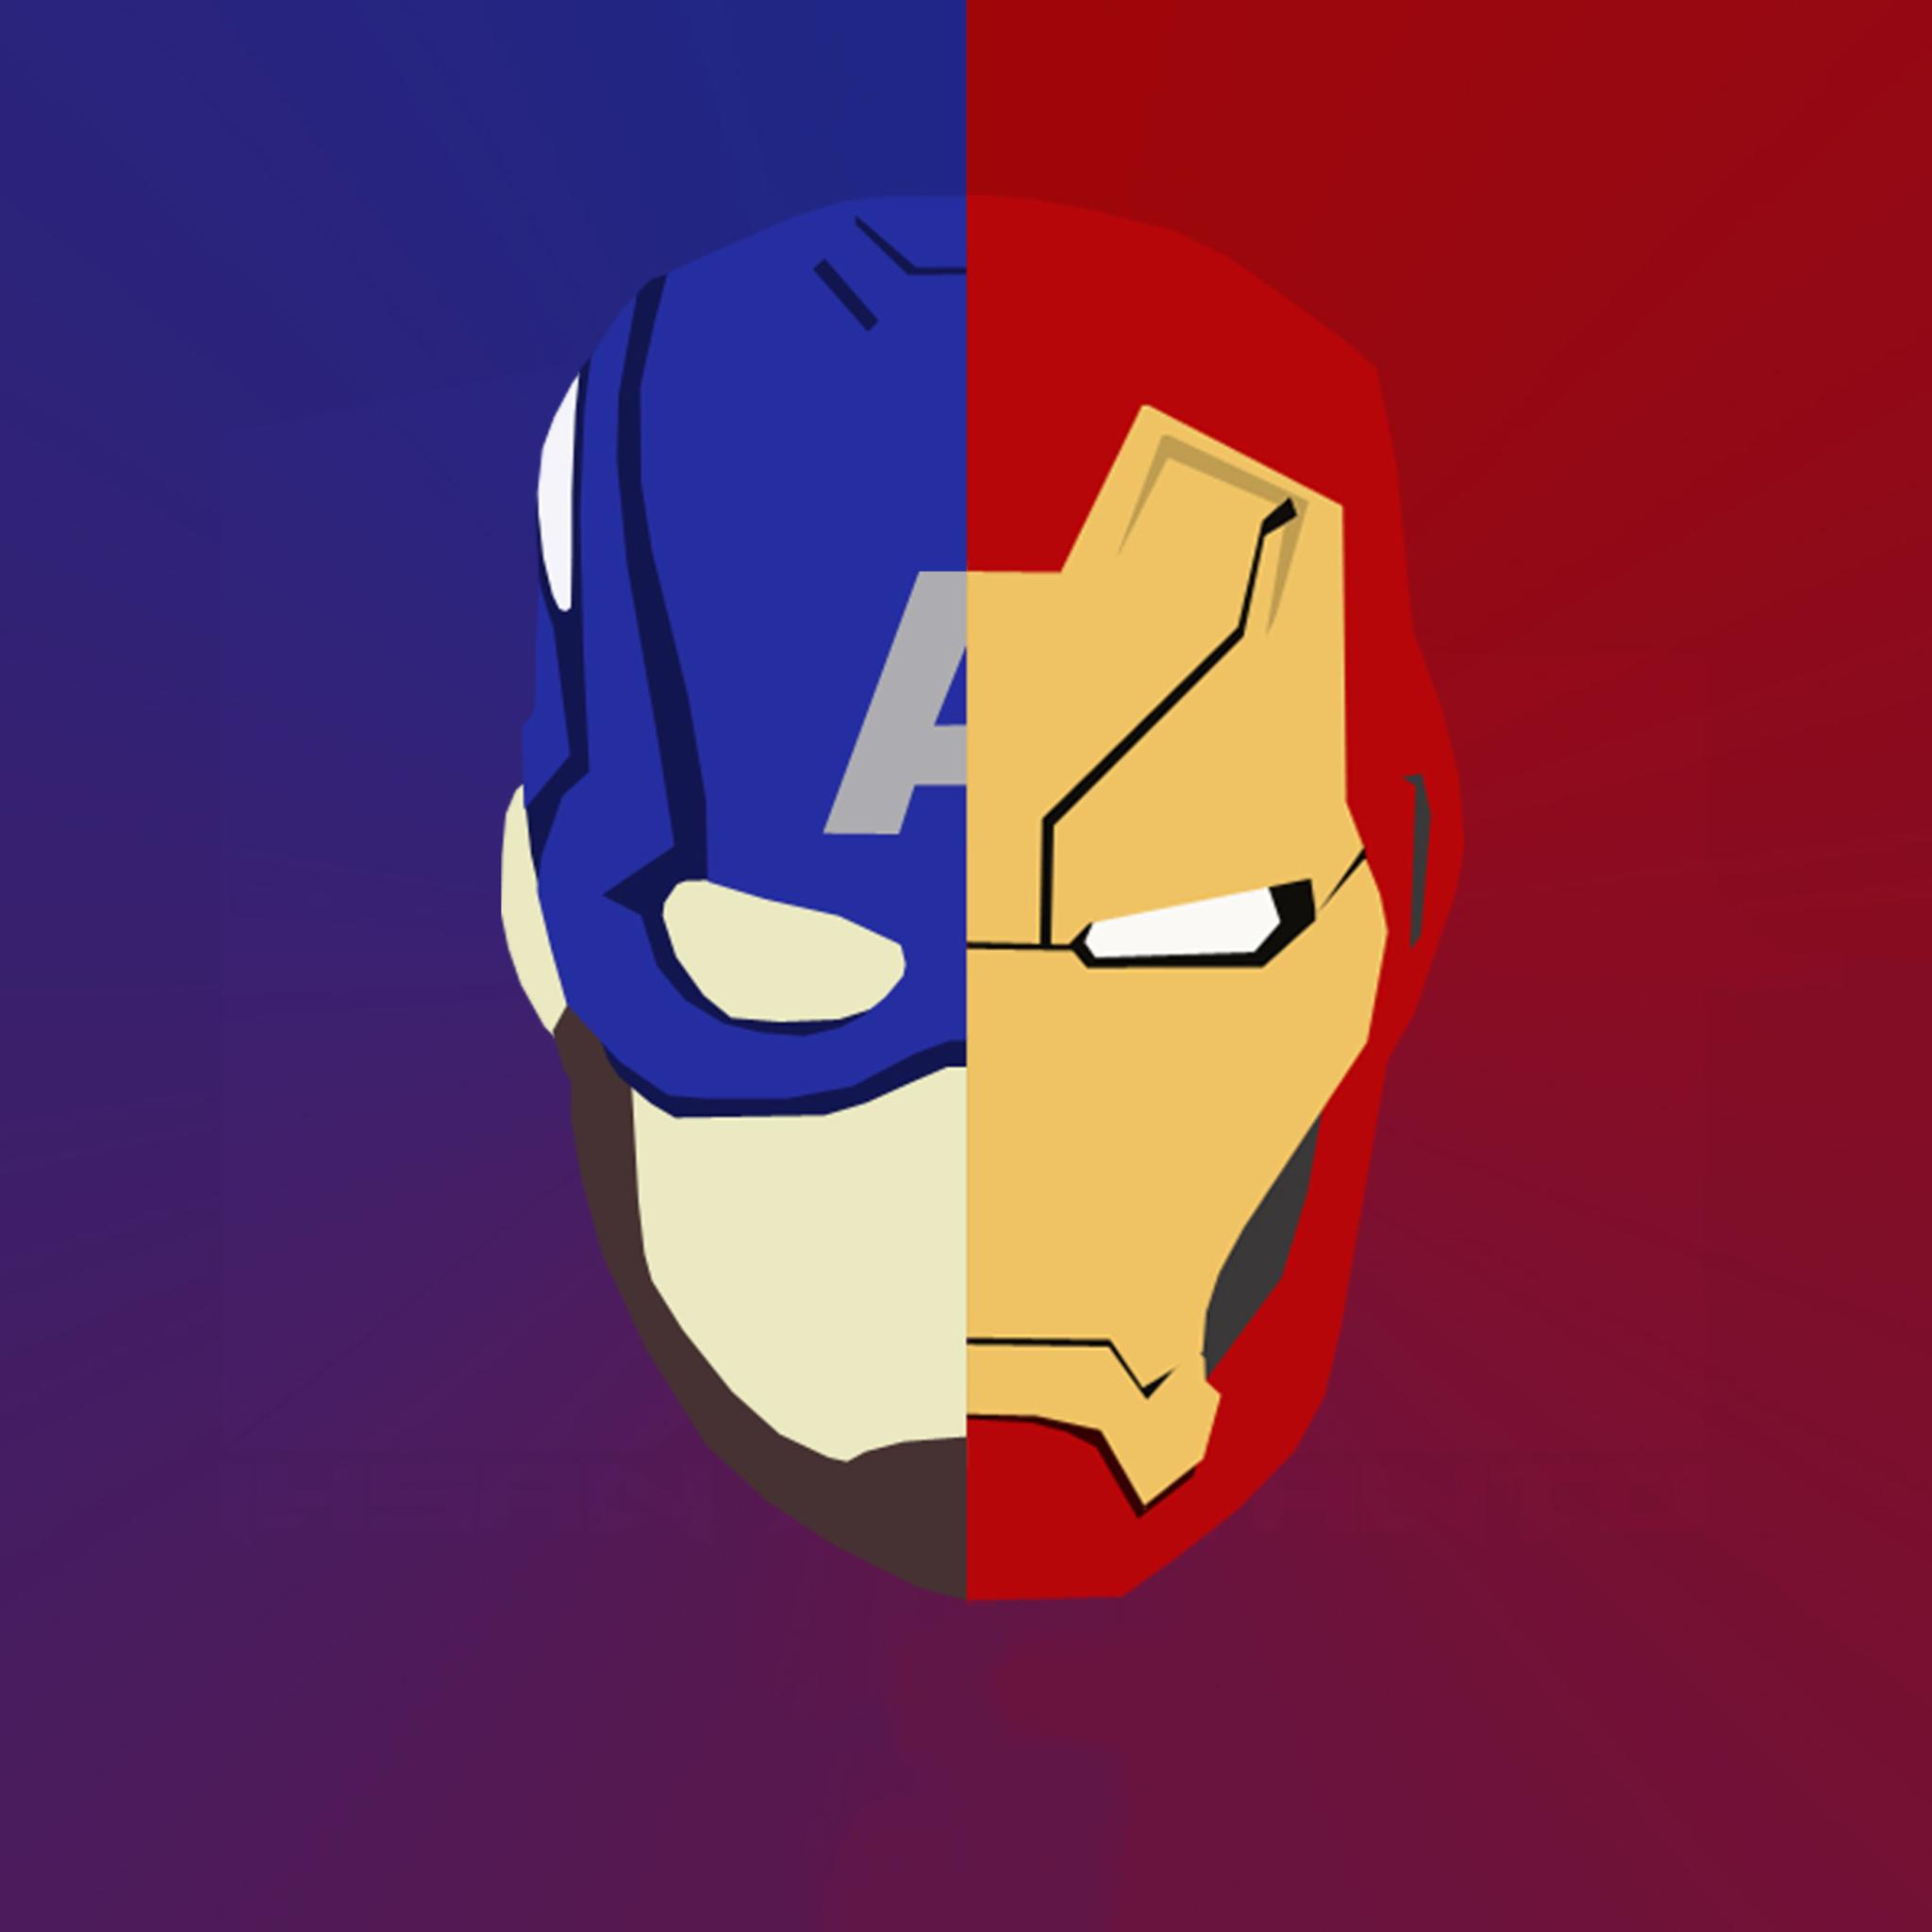 iron-man-and-captain-america-artwork-v3.jpg